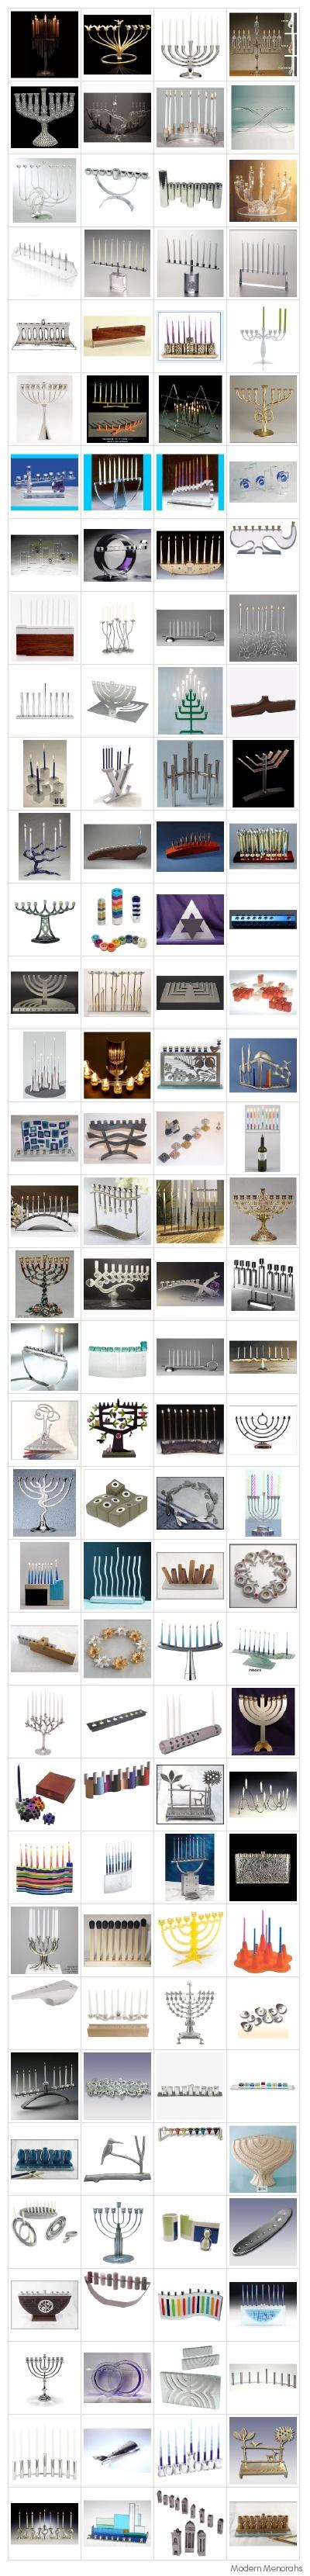 best holidays images on pinterest hanukkah menorah hanukkah